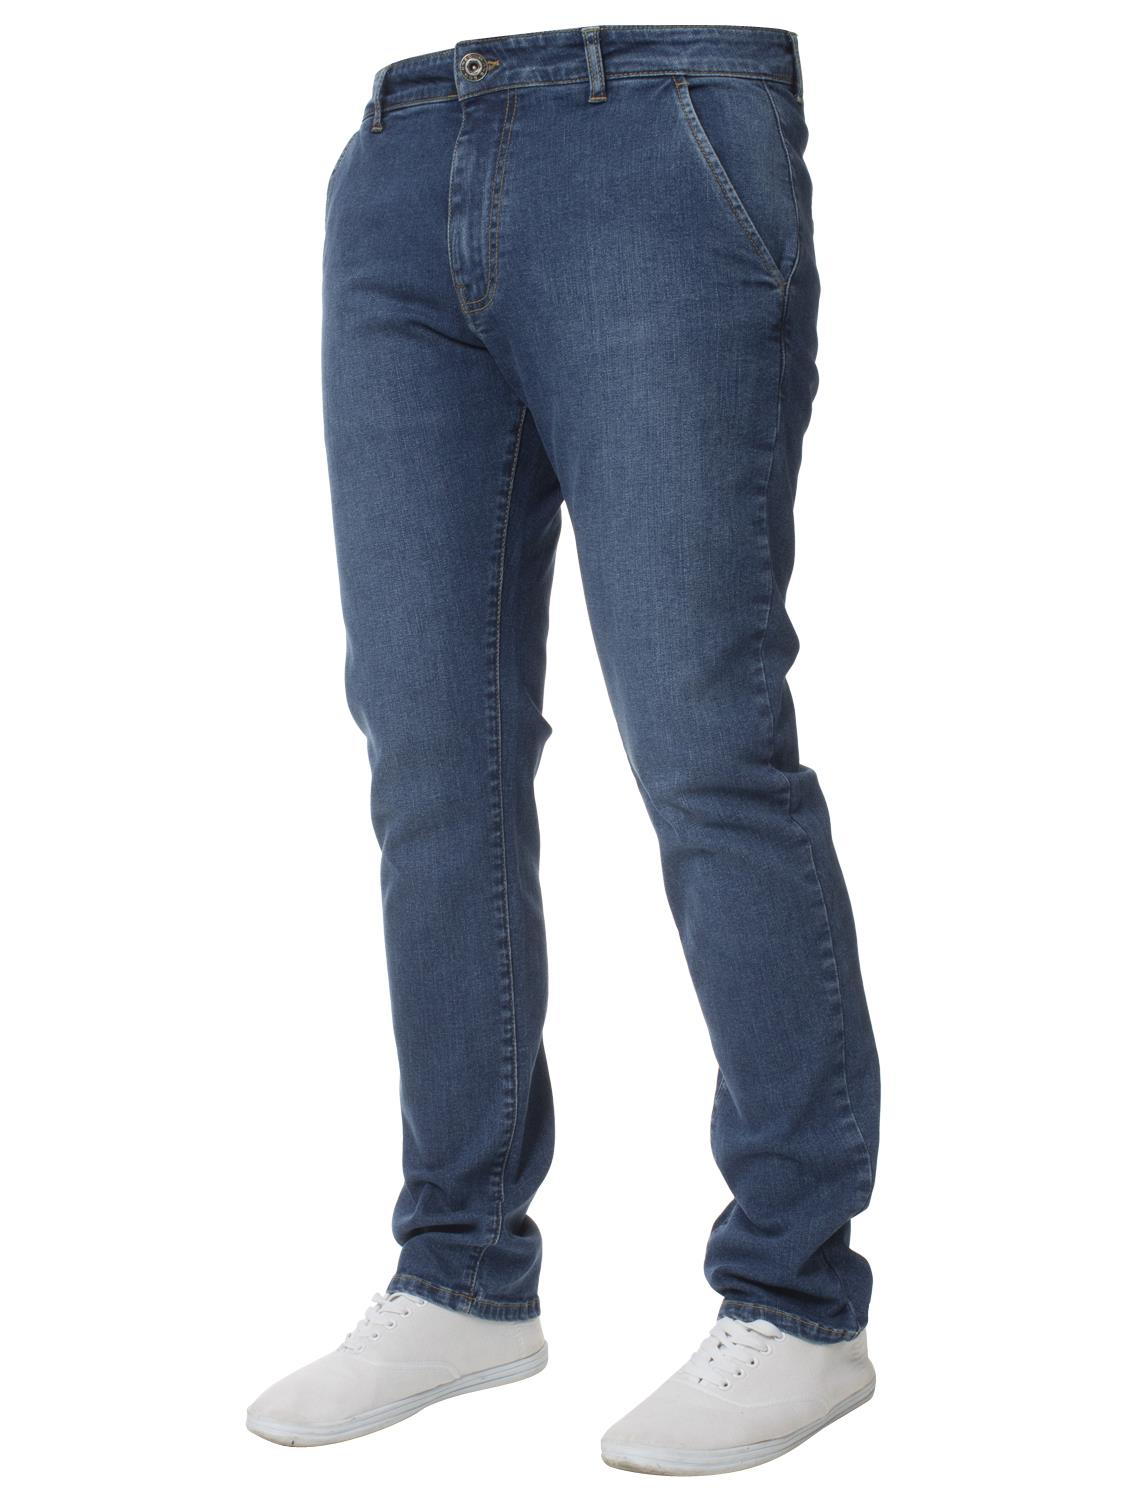 ENZO-Jeans-para-hombre-Big-Alto-Pierna-King-Size-Jeans-Pantalones-Chino-Pantalones-Pantalones-44-034 miniatura 34